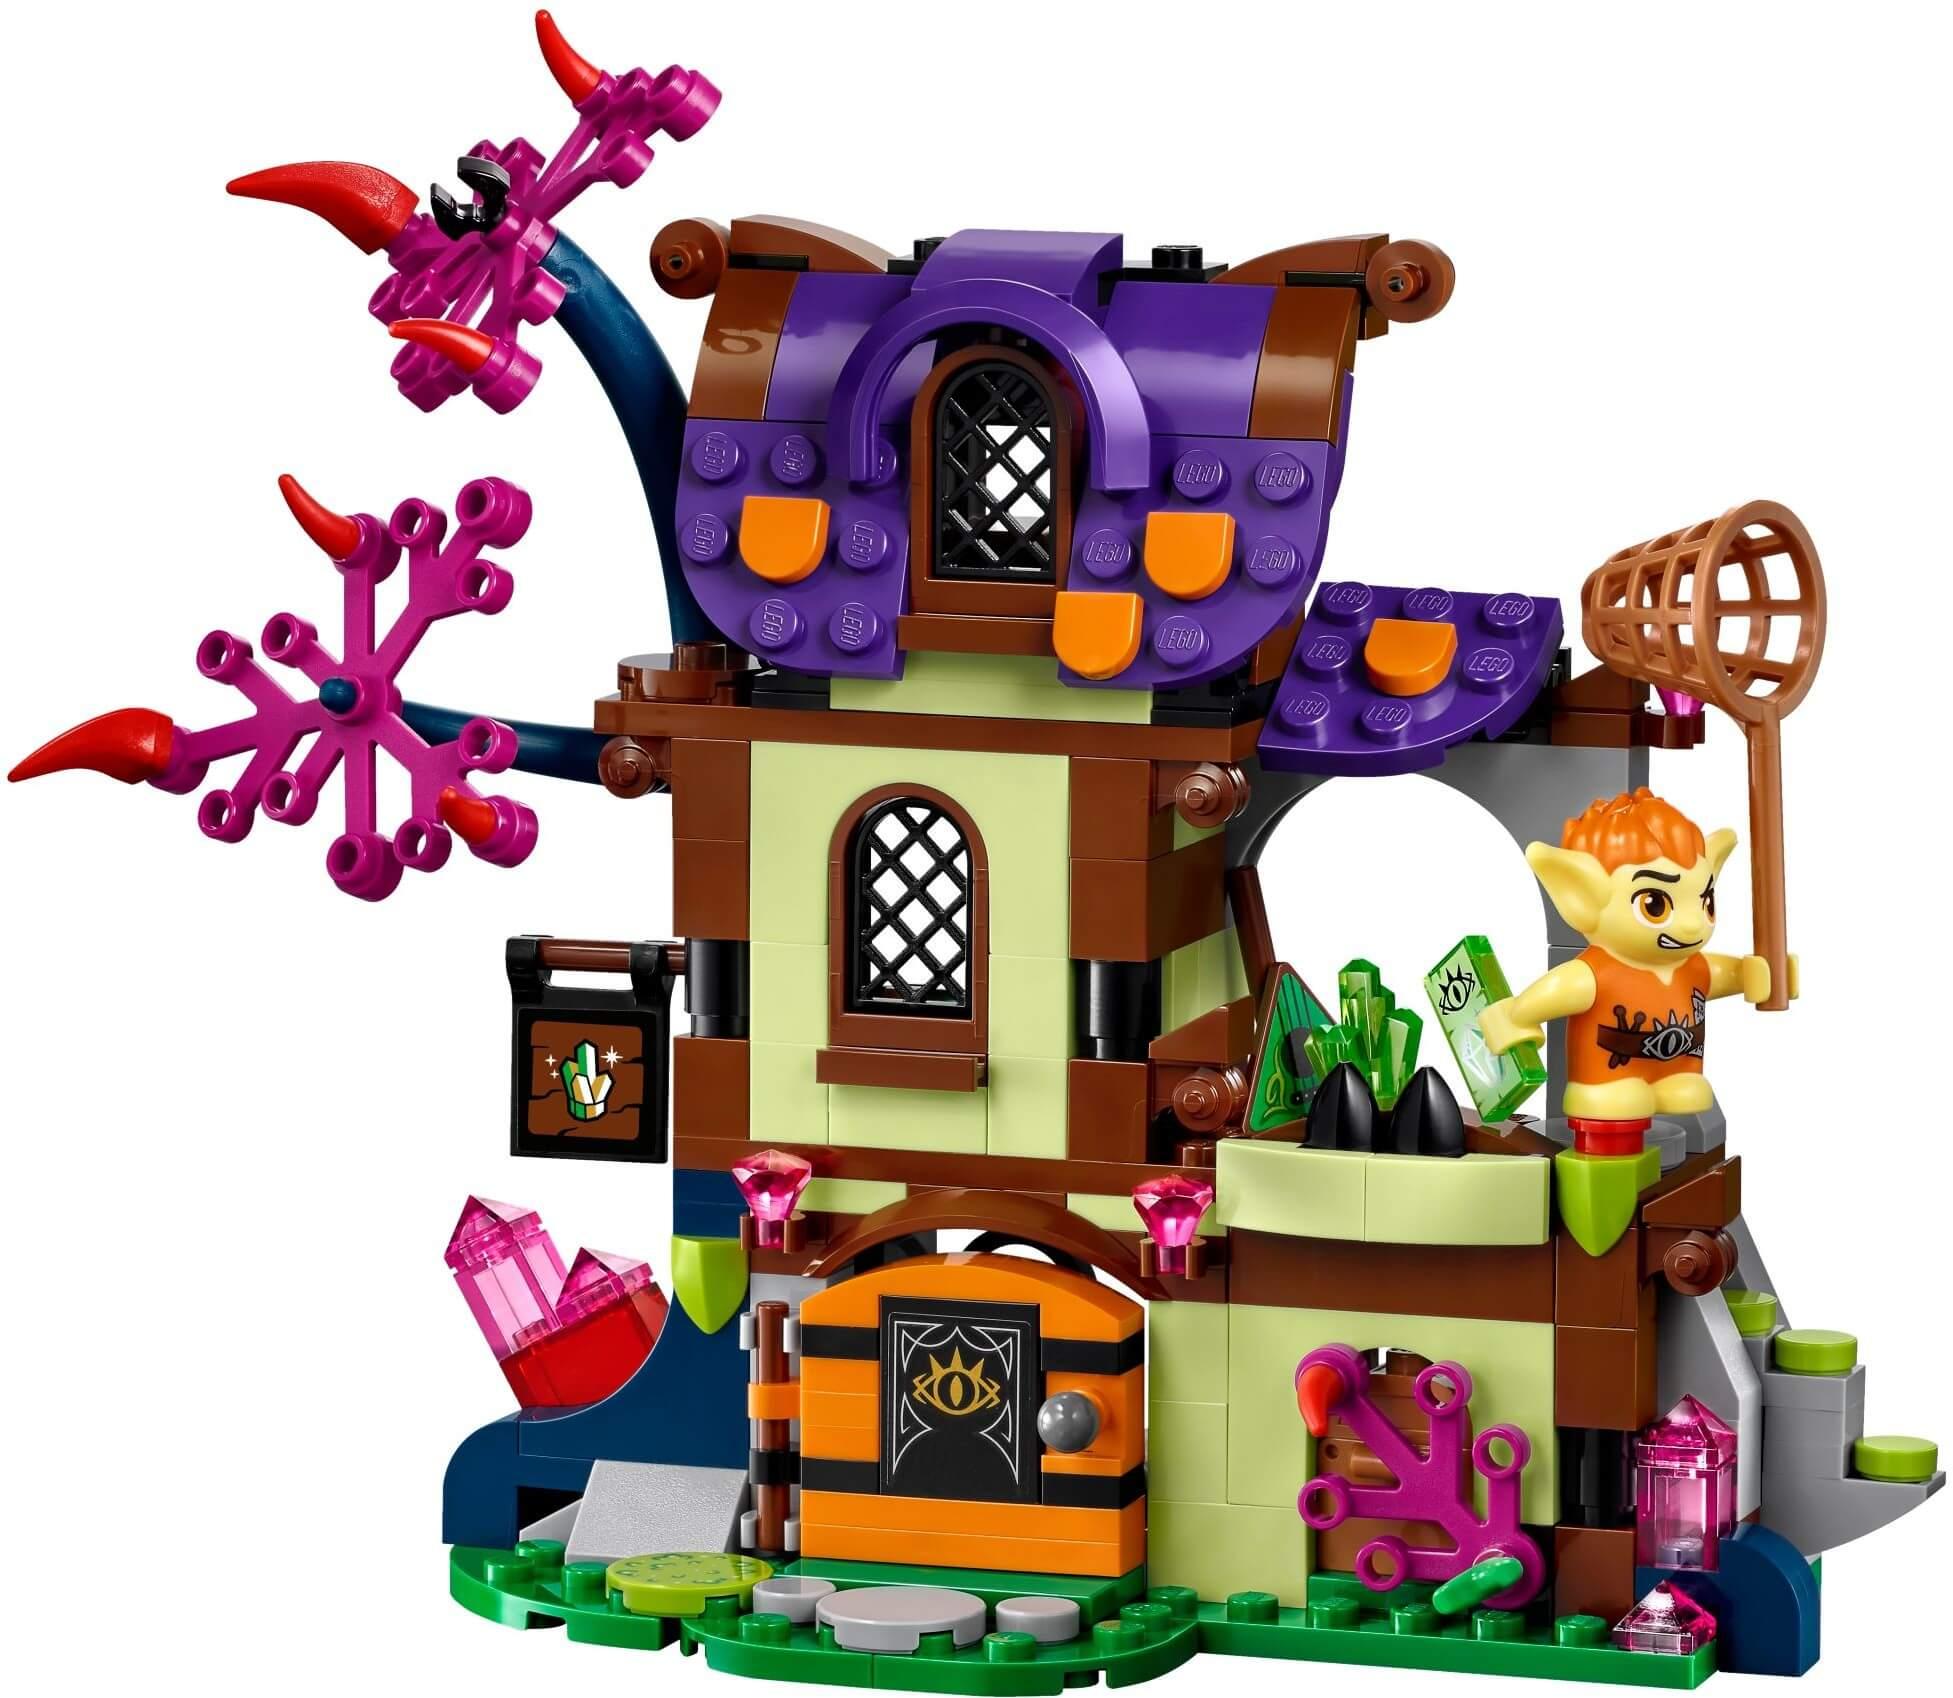 Mua đồ chơi LEGO 41185 - LEGO 41185 - Ngôi Làng Yêu Tinh (LEGO Elves Magic Rescue from the Goblin Village)